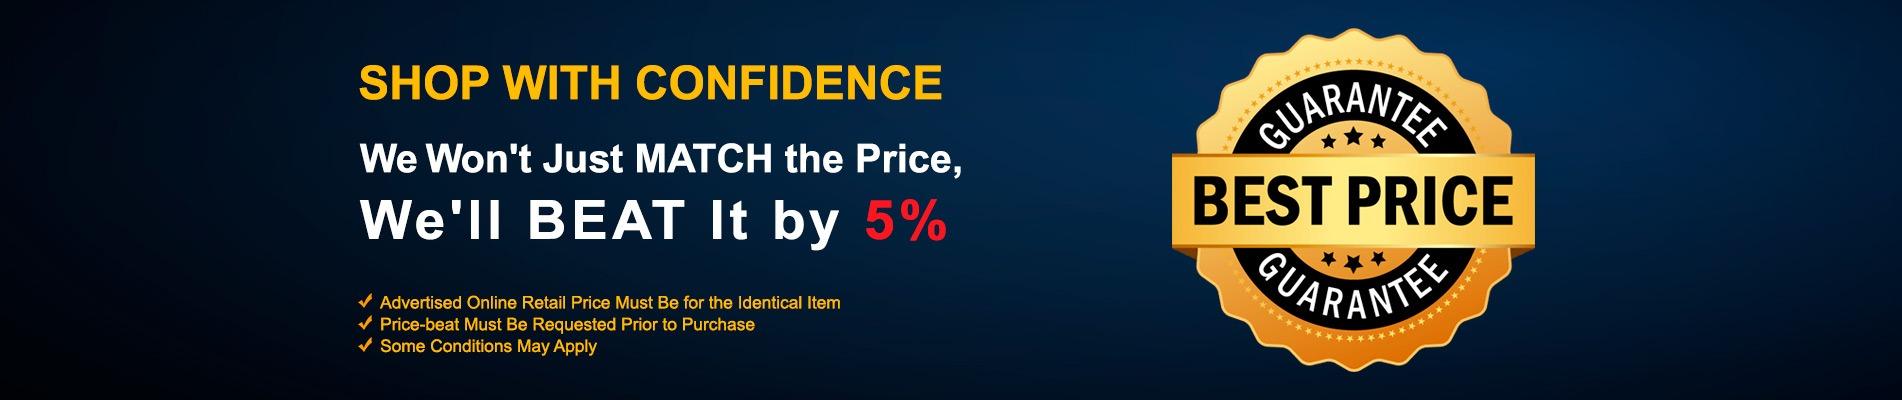 Best Price Guarantee